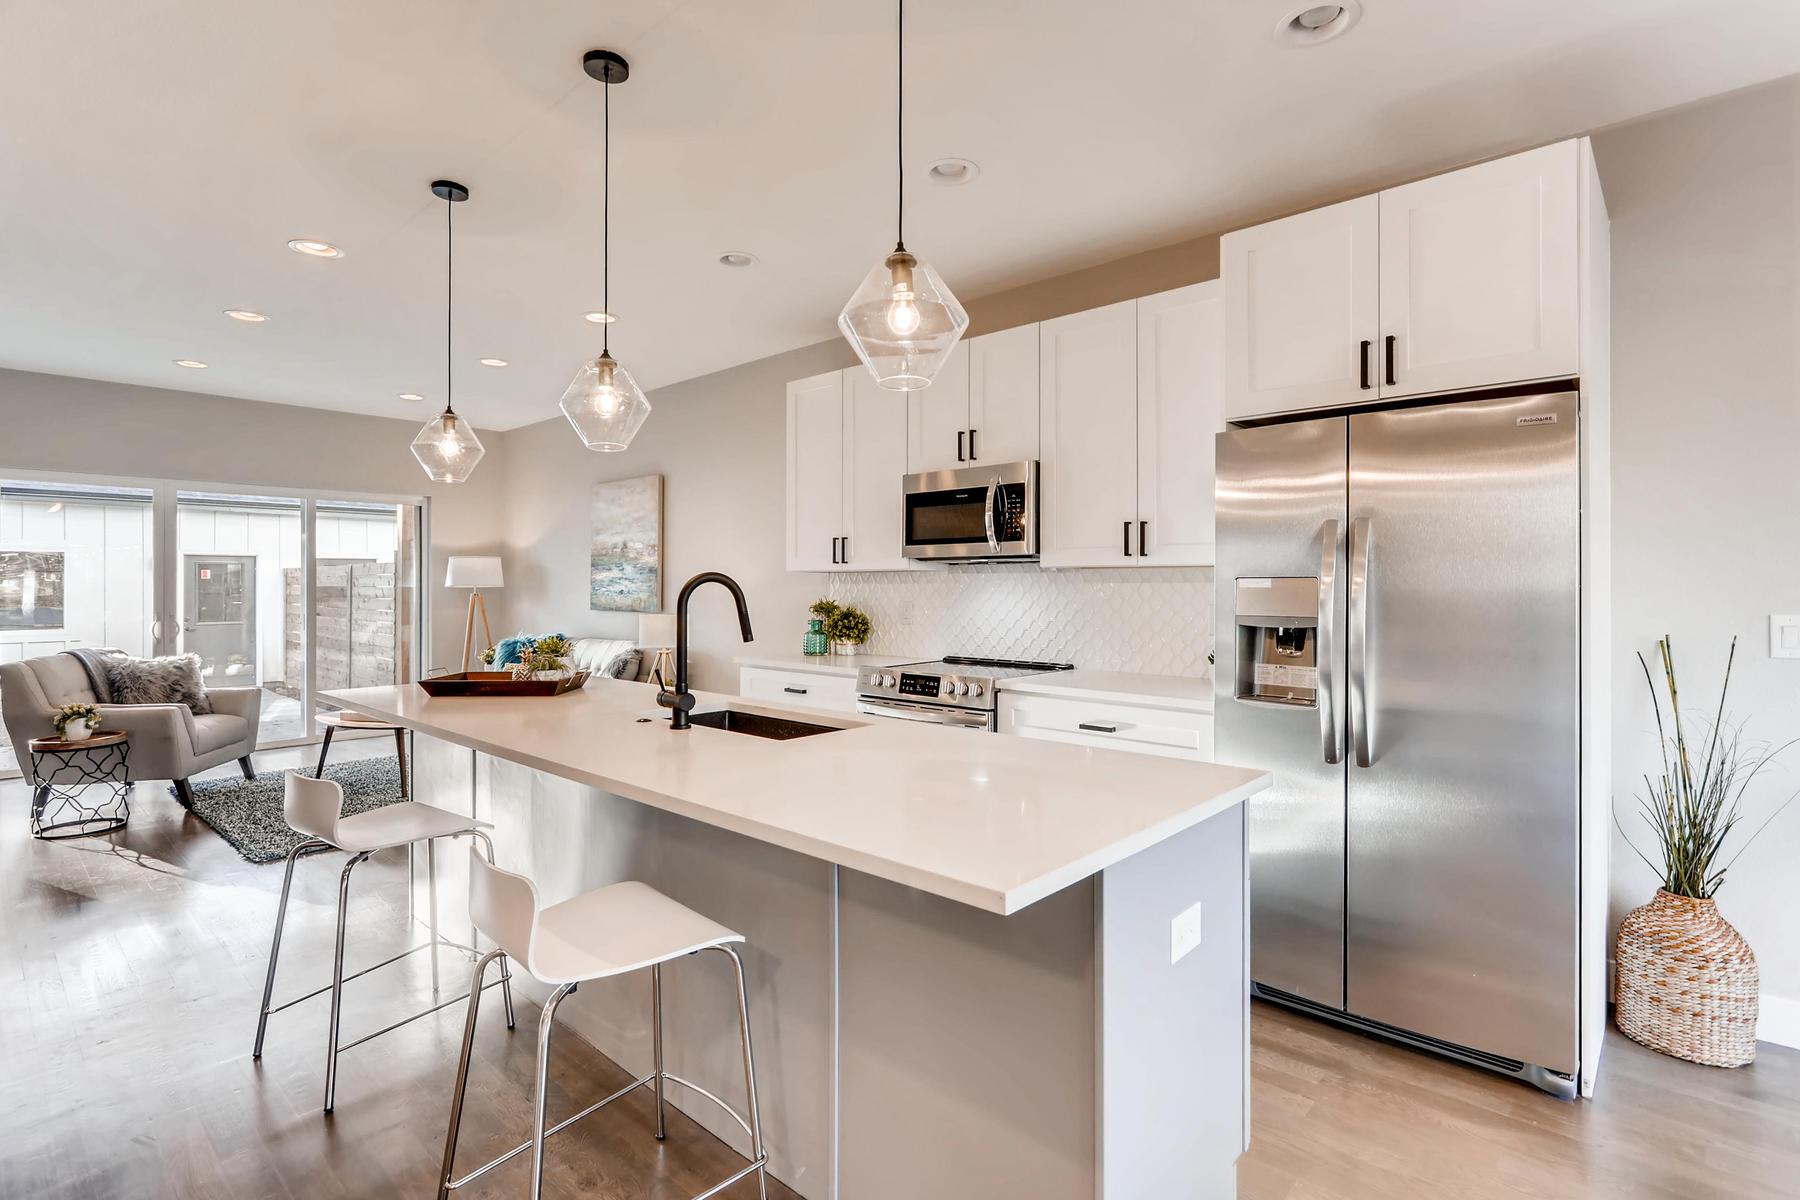 3105 S Cherokee St Englewood-011-8-Kitchen-MLS_Size.jpg